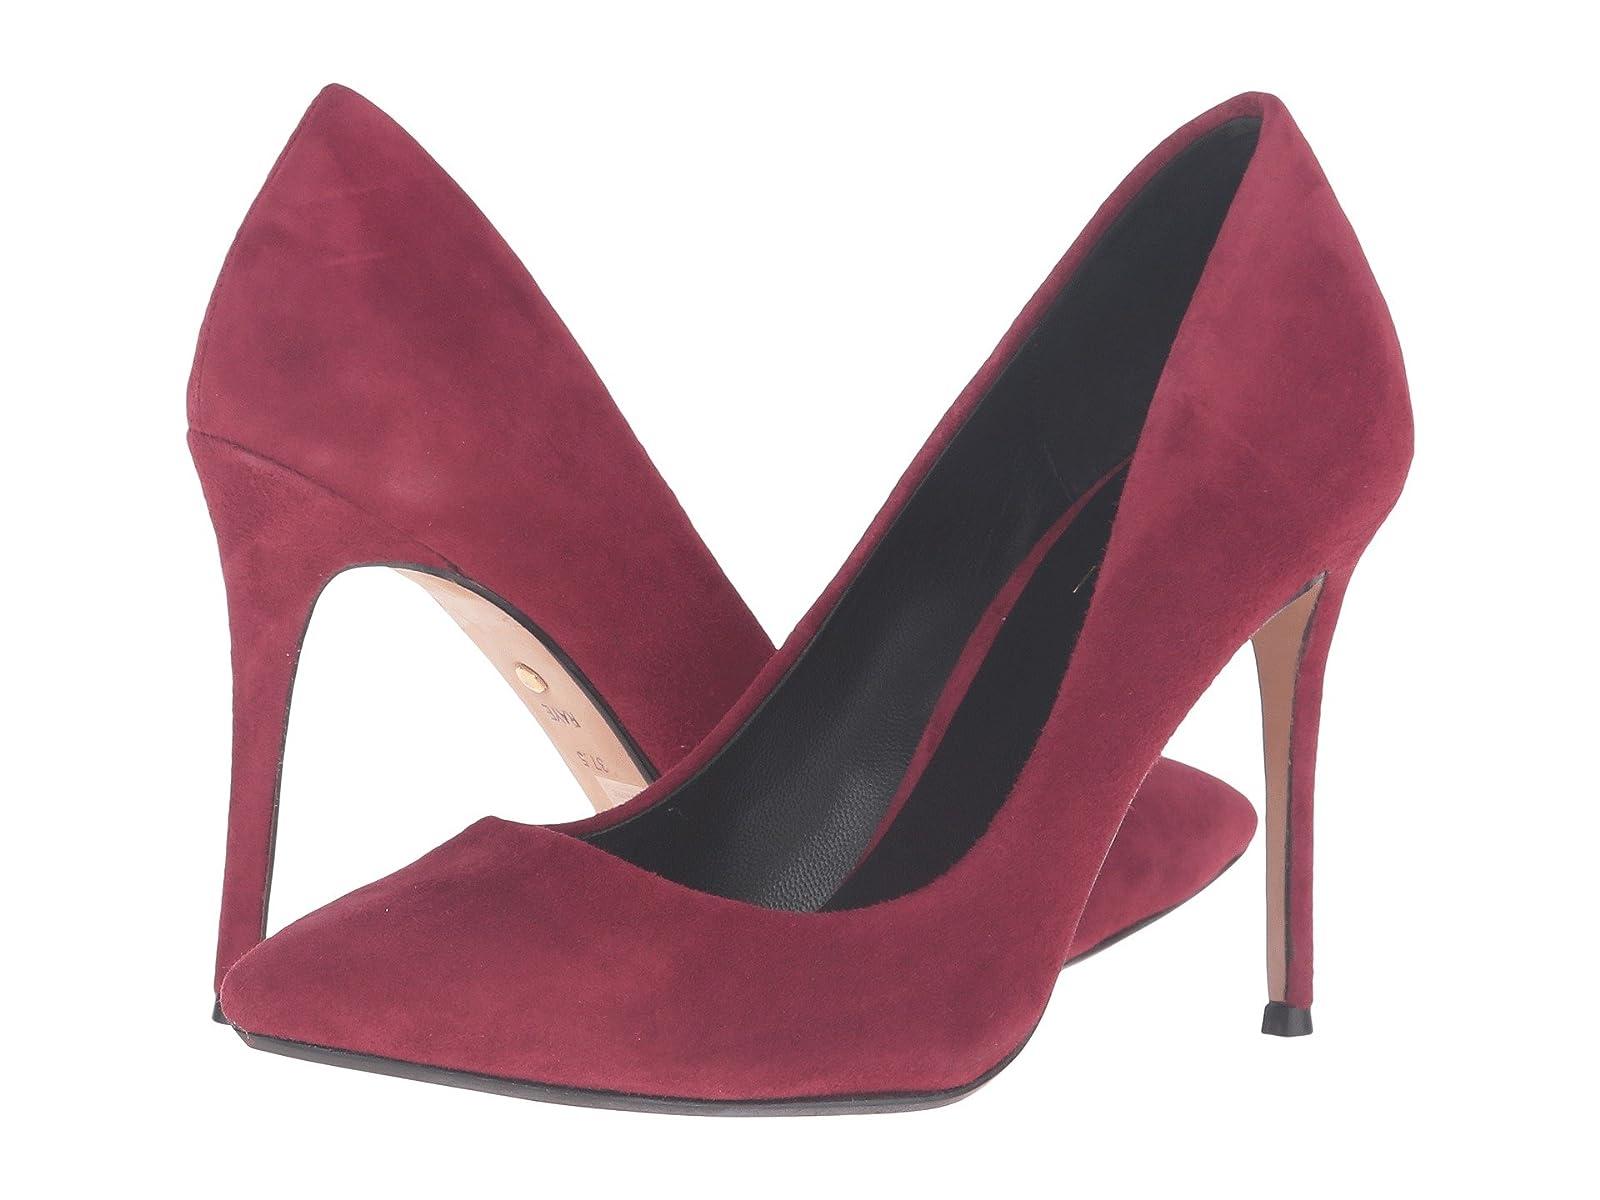 RAYE TiaCheap and distinctive eye-catching shoes